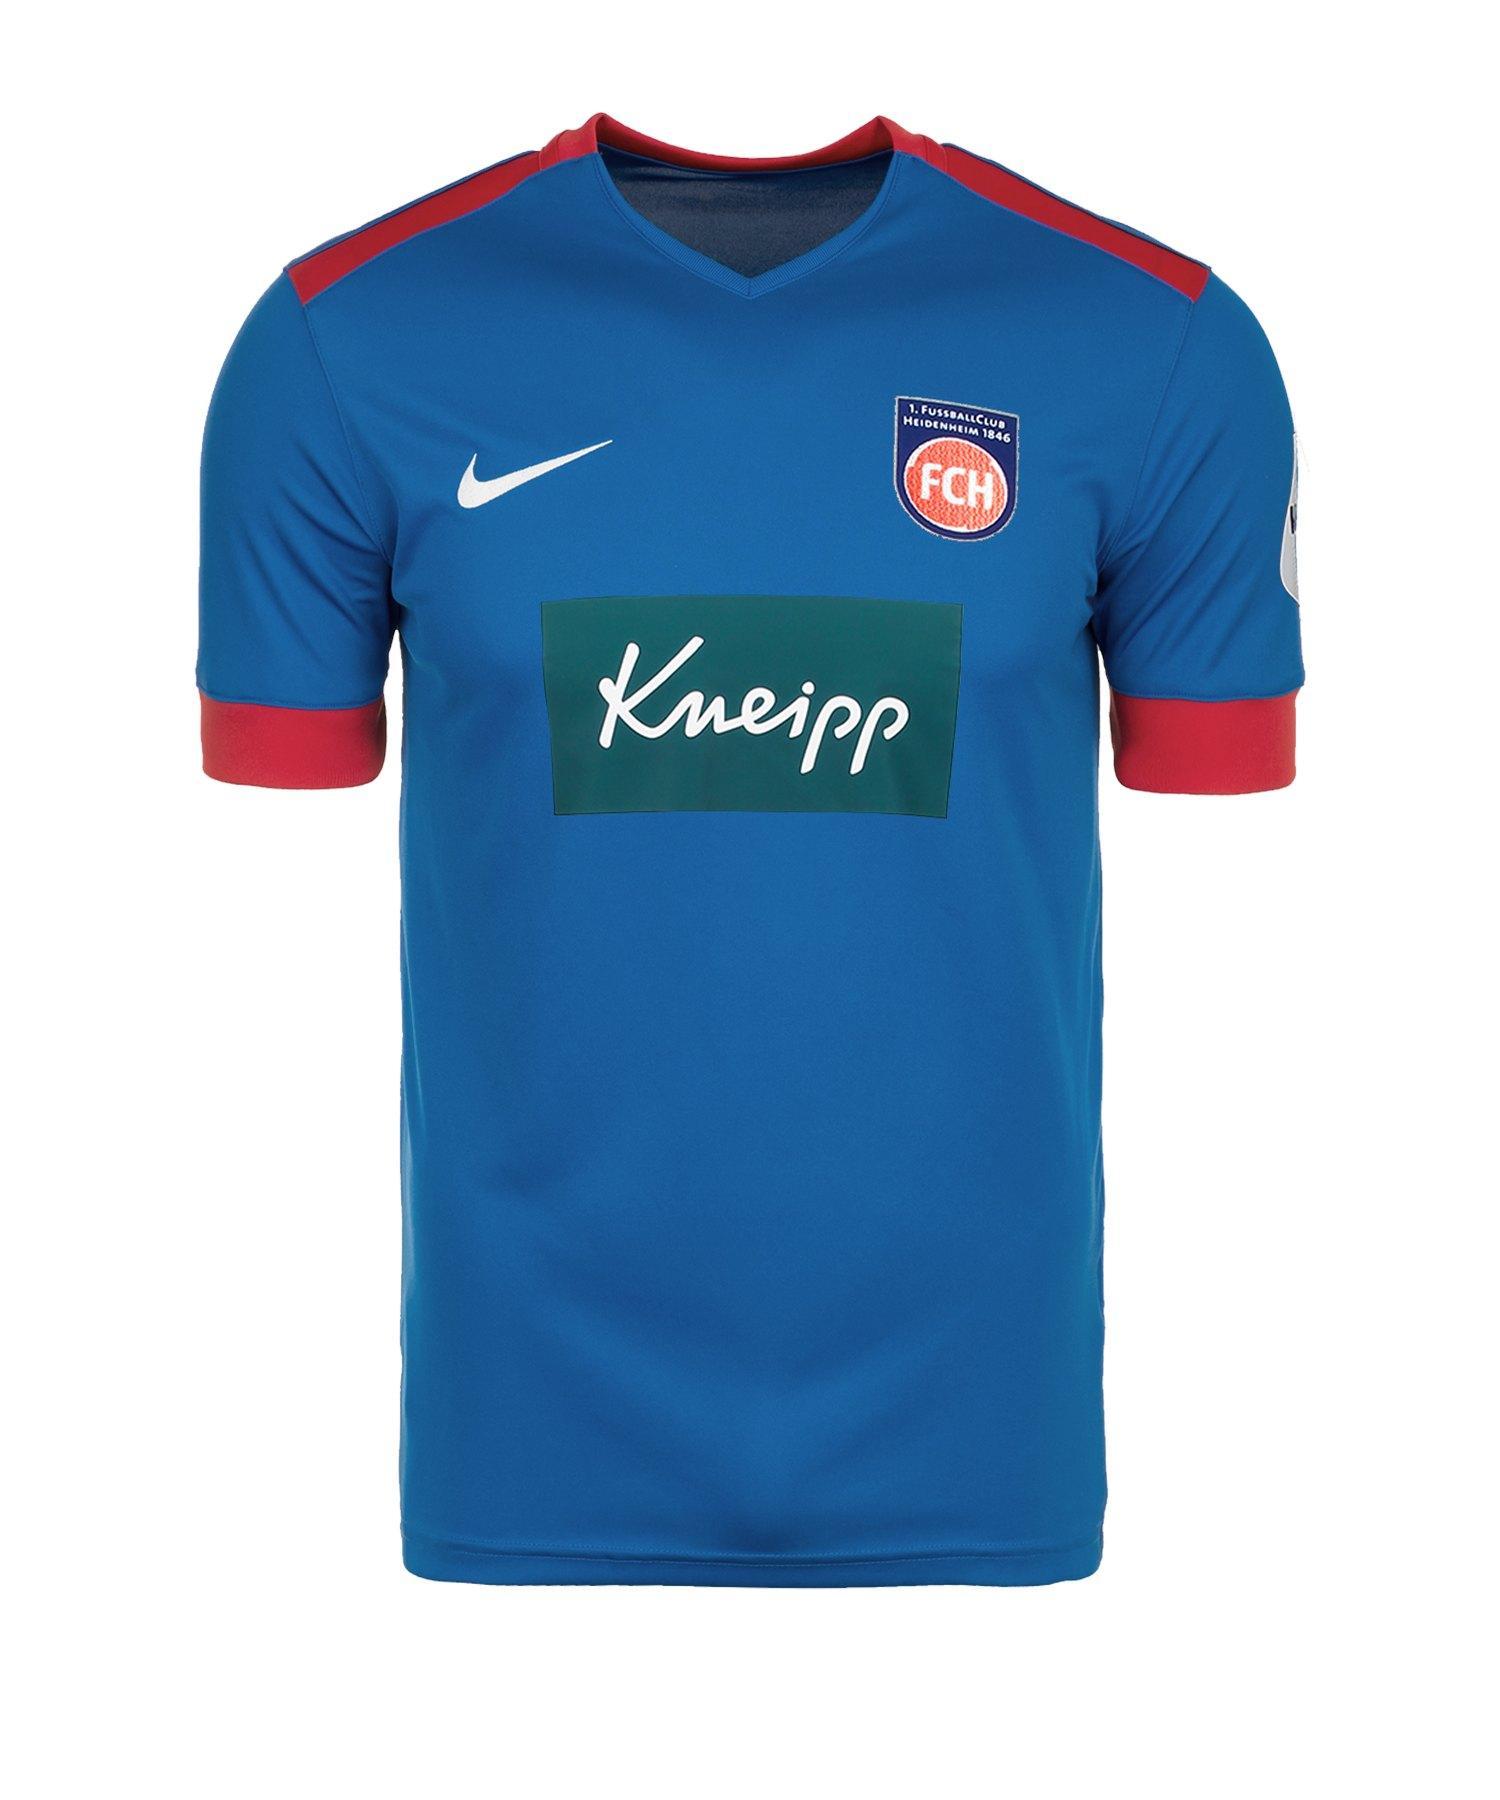 Nike 1. FC Heidenheim Trikot Away 2019/2020 F463 - blau